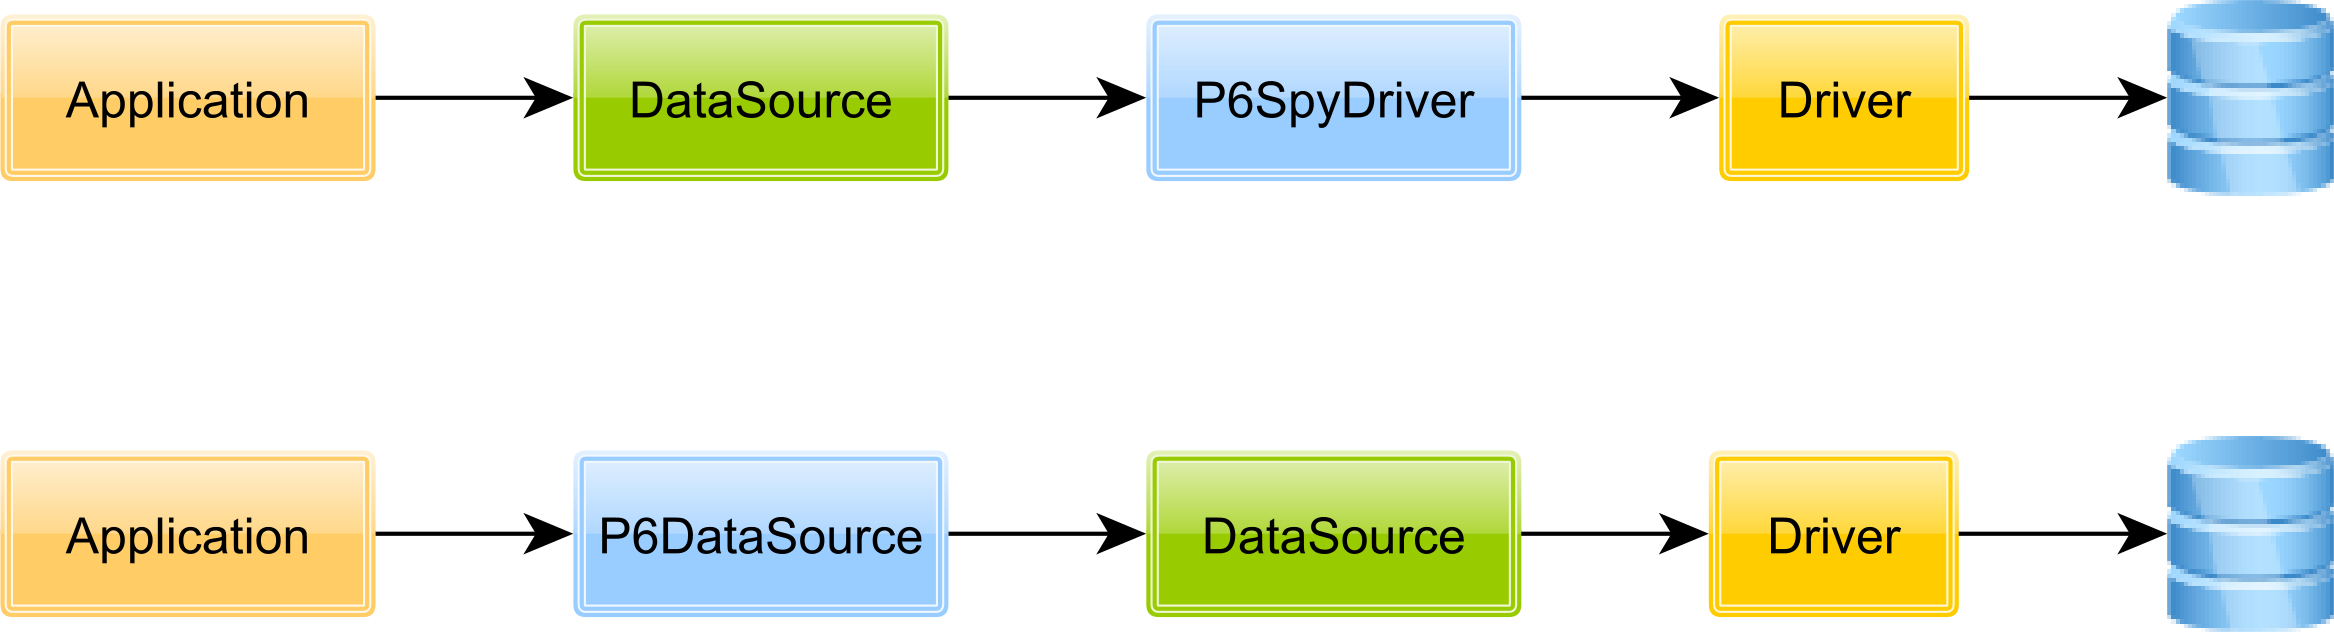 P6Spy Architecture